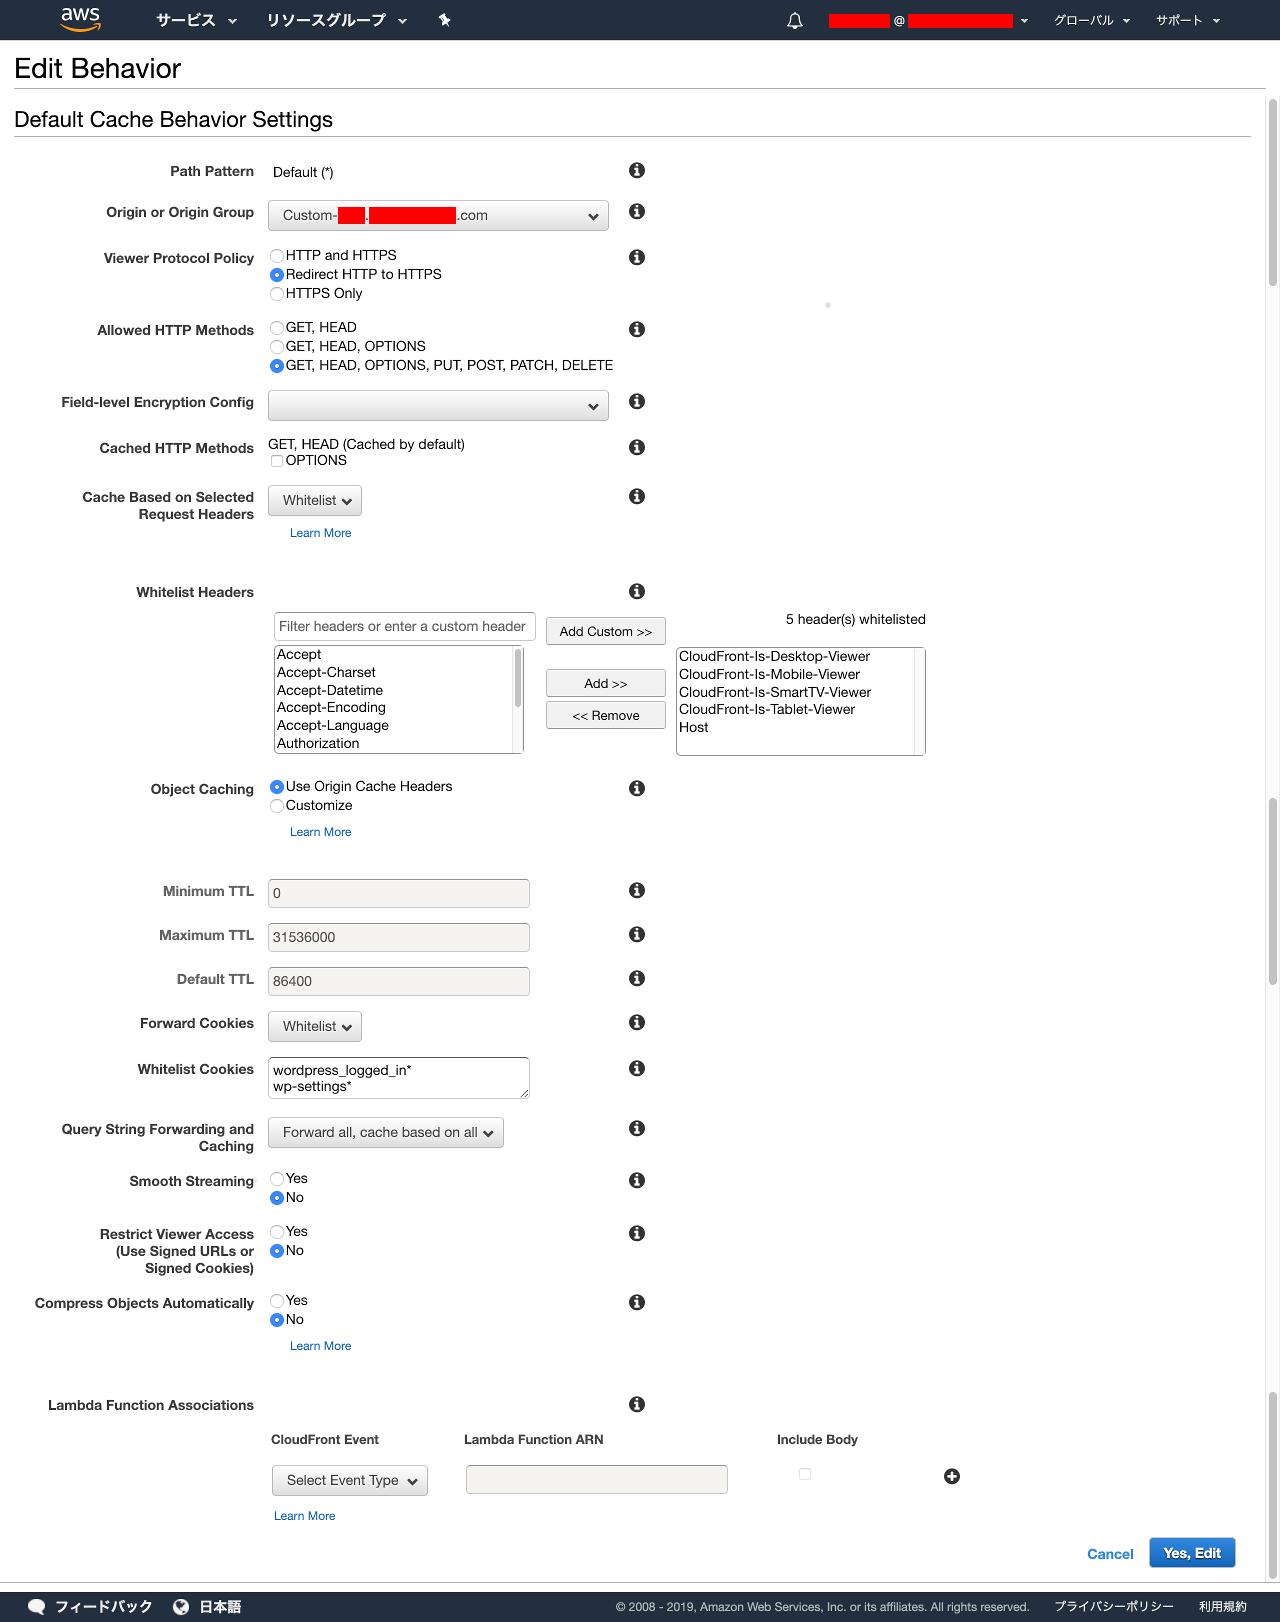 FireShot Capture 427 - AWS CloudFront Management C_ - https___console.aws.amazon.com_cloudfront_home.png